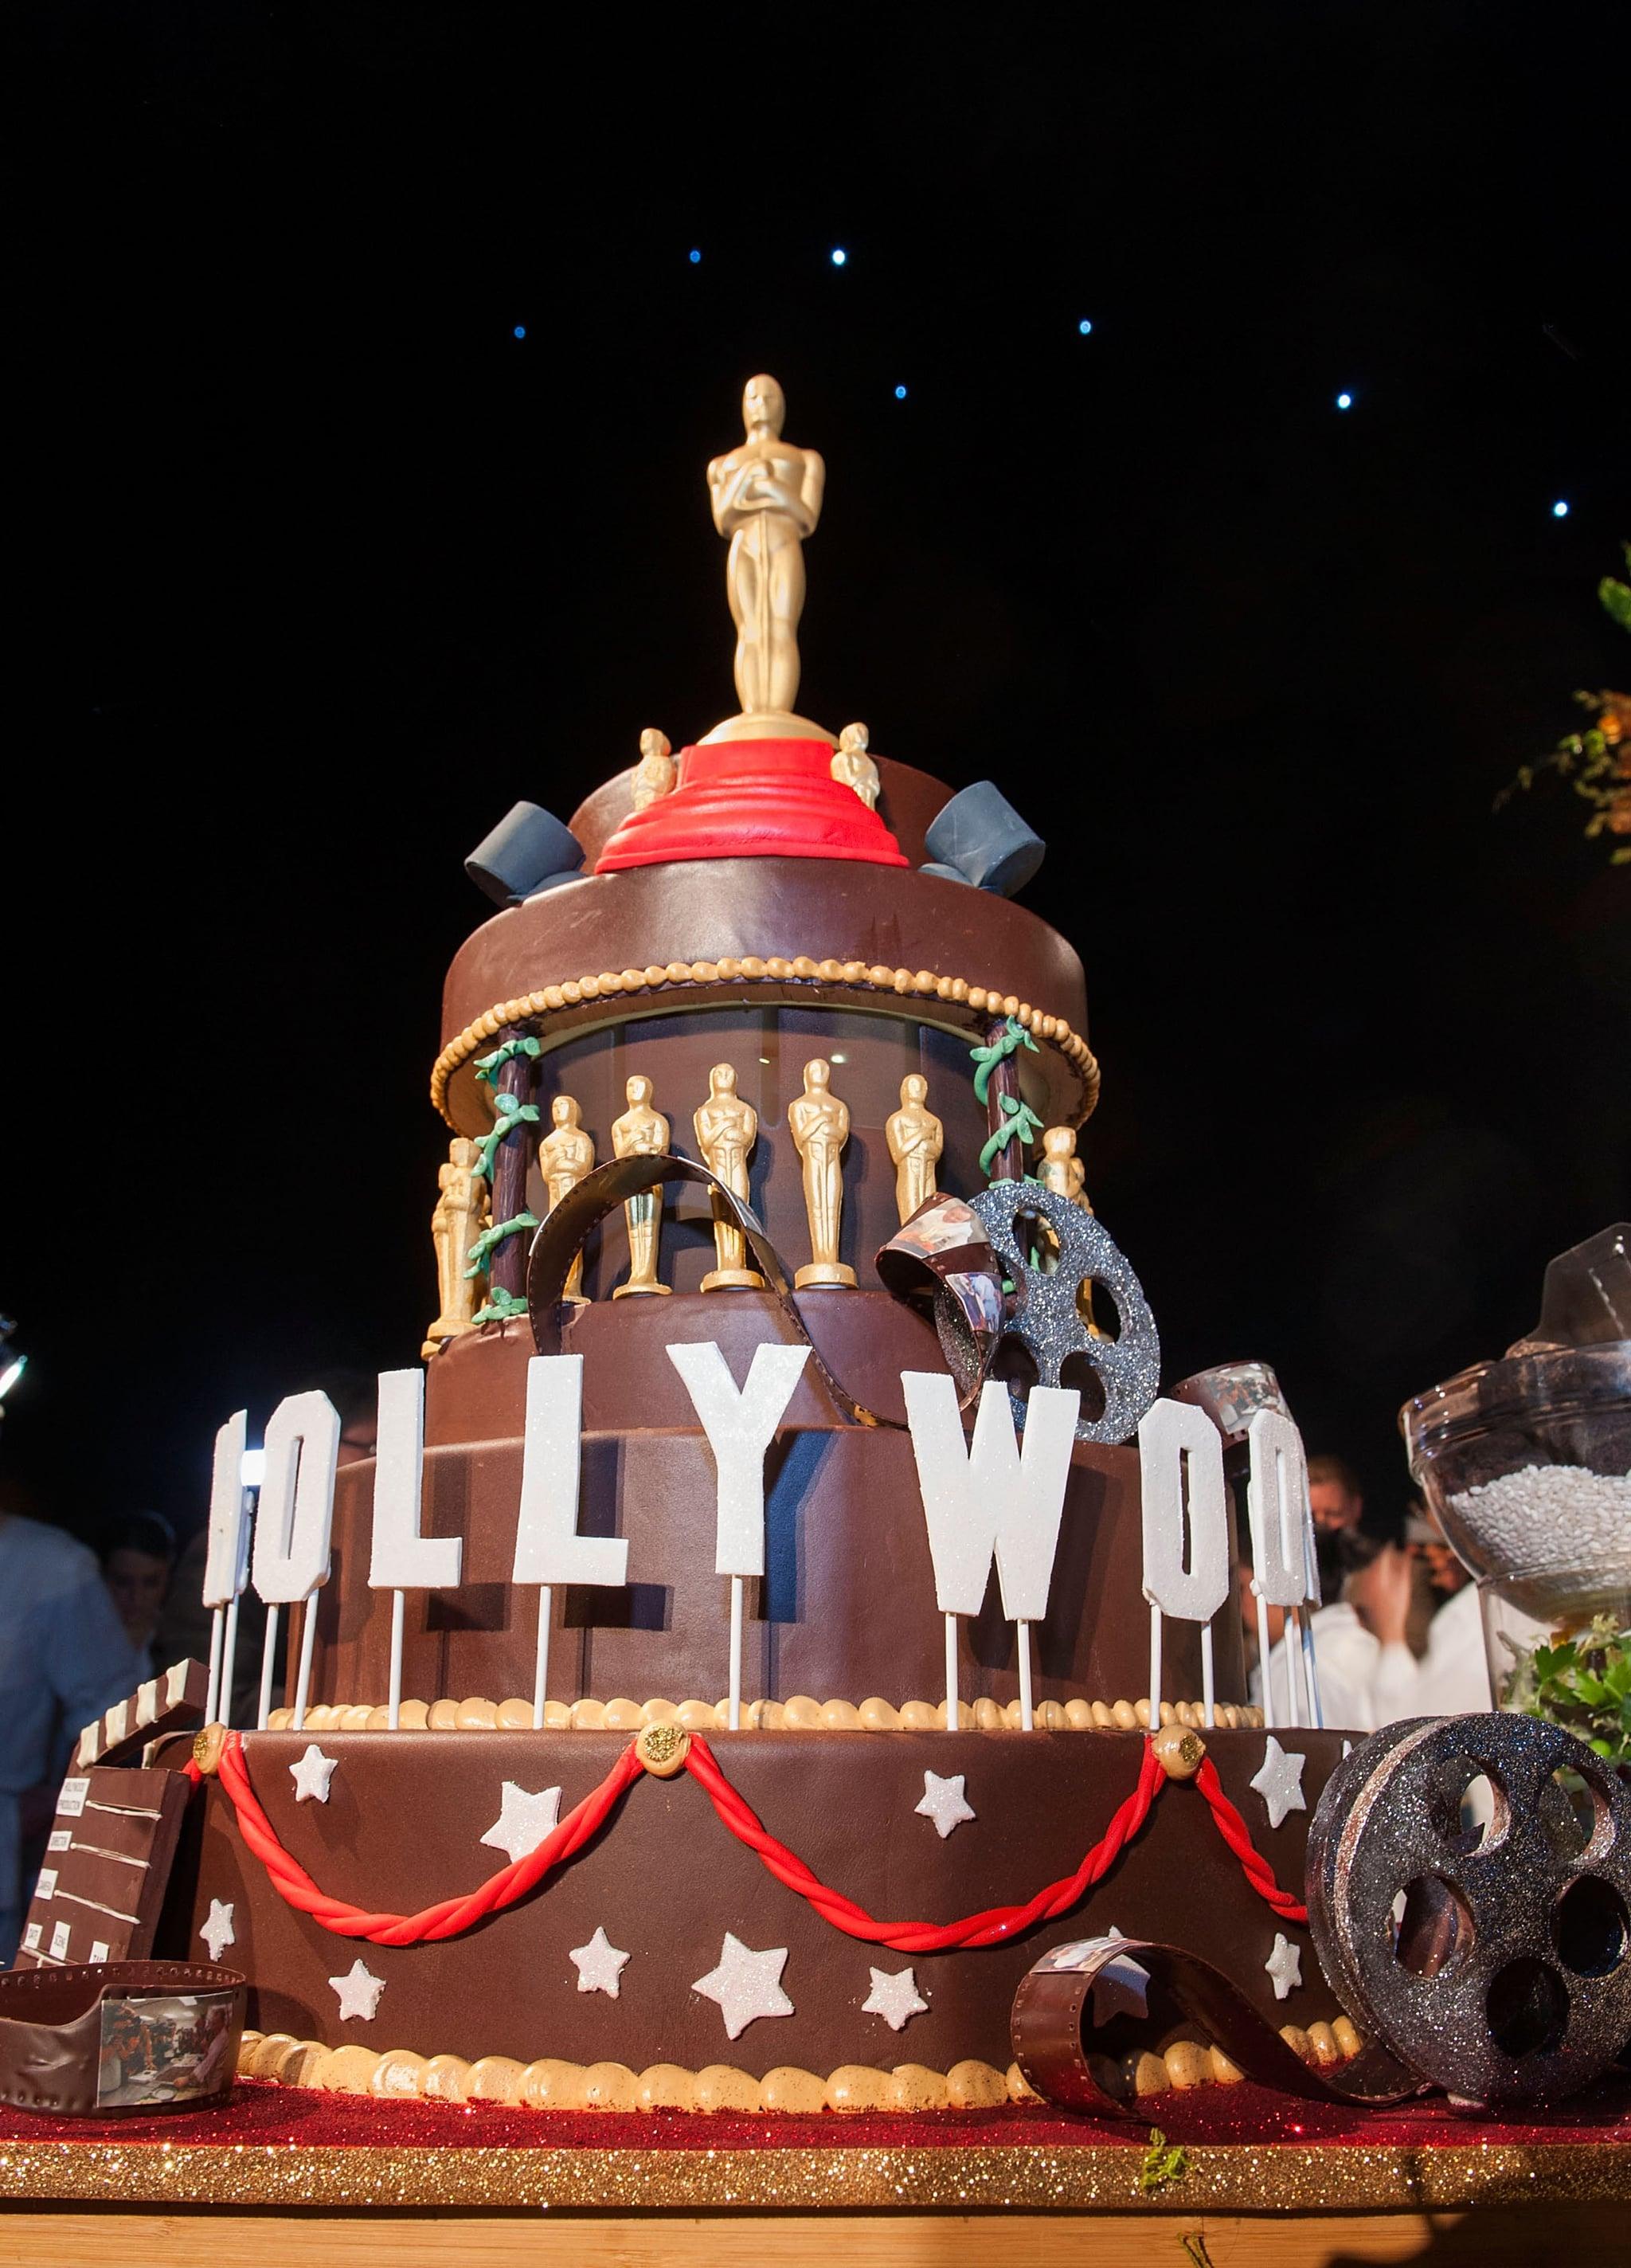 Hollywood Cake